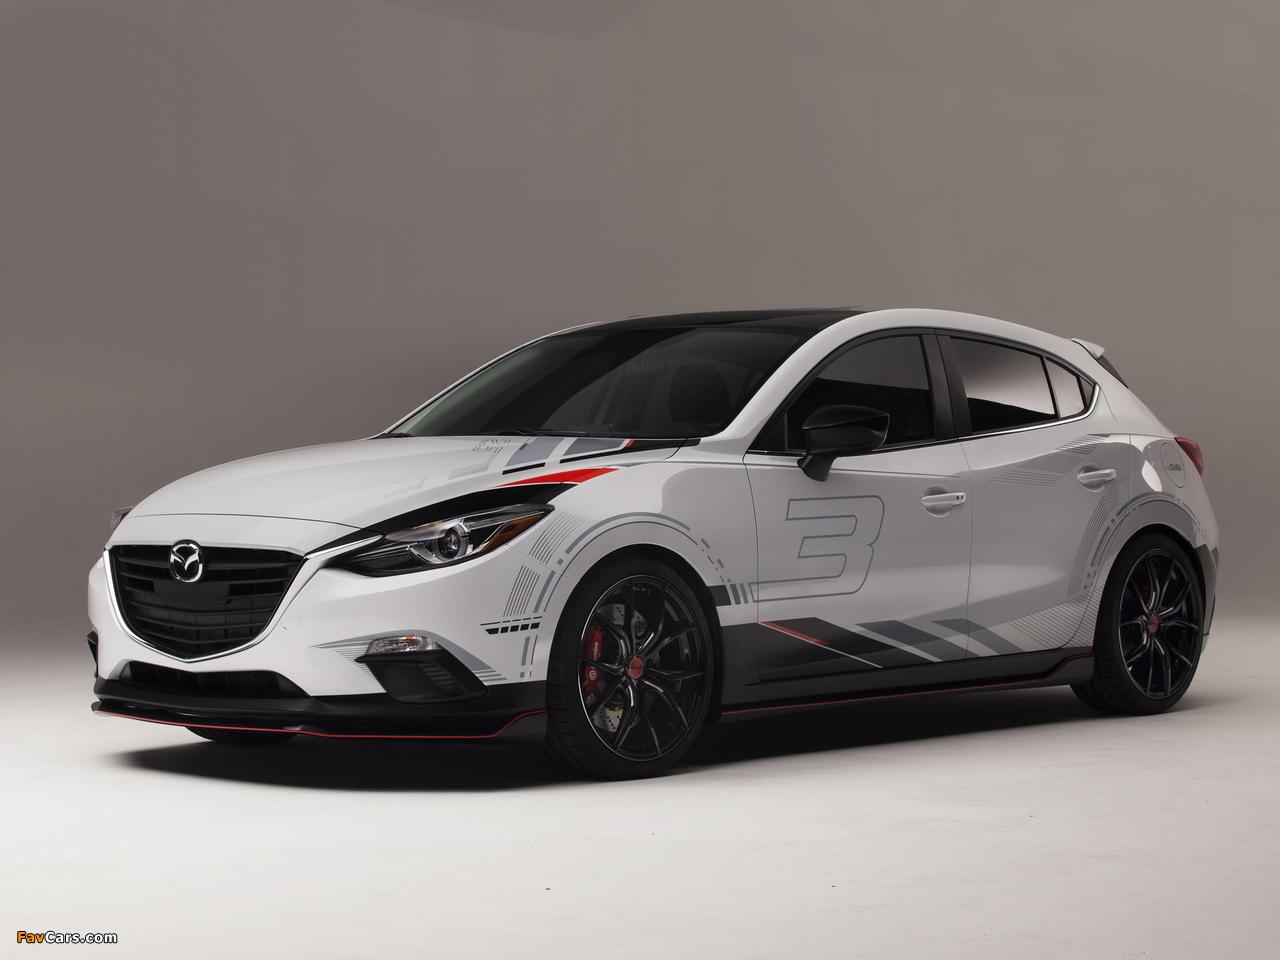 Mazda Club Sport 3 Concept (BM) 2013 pictures (1280 x 960)